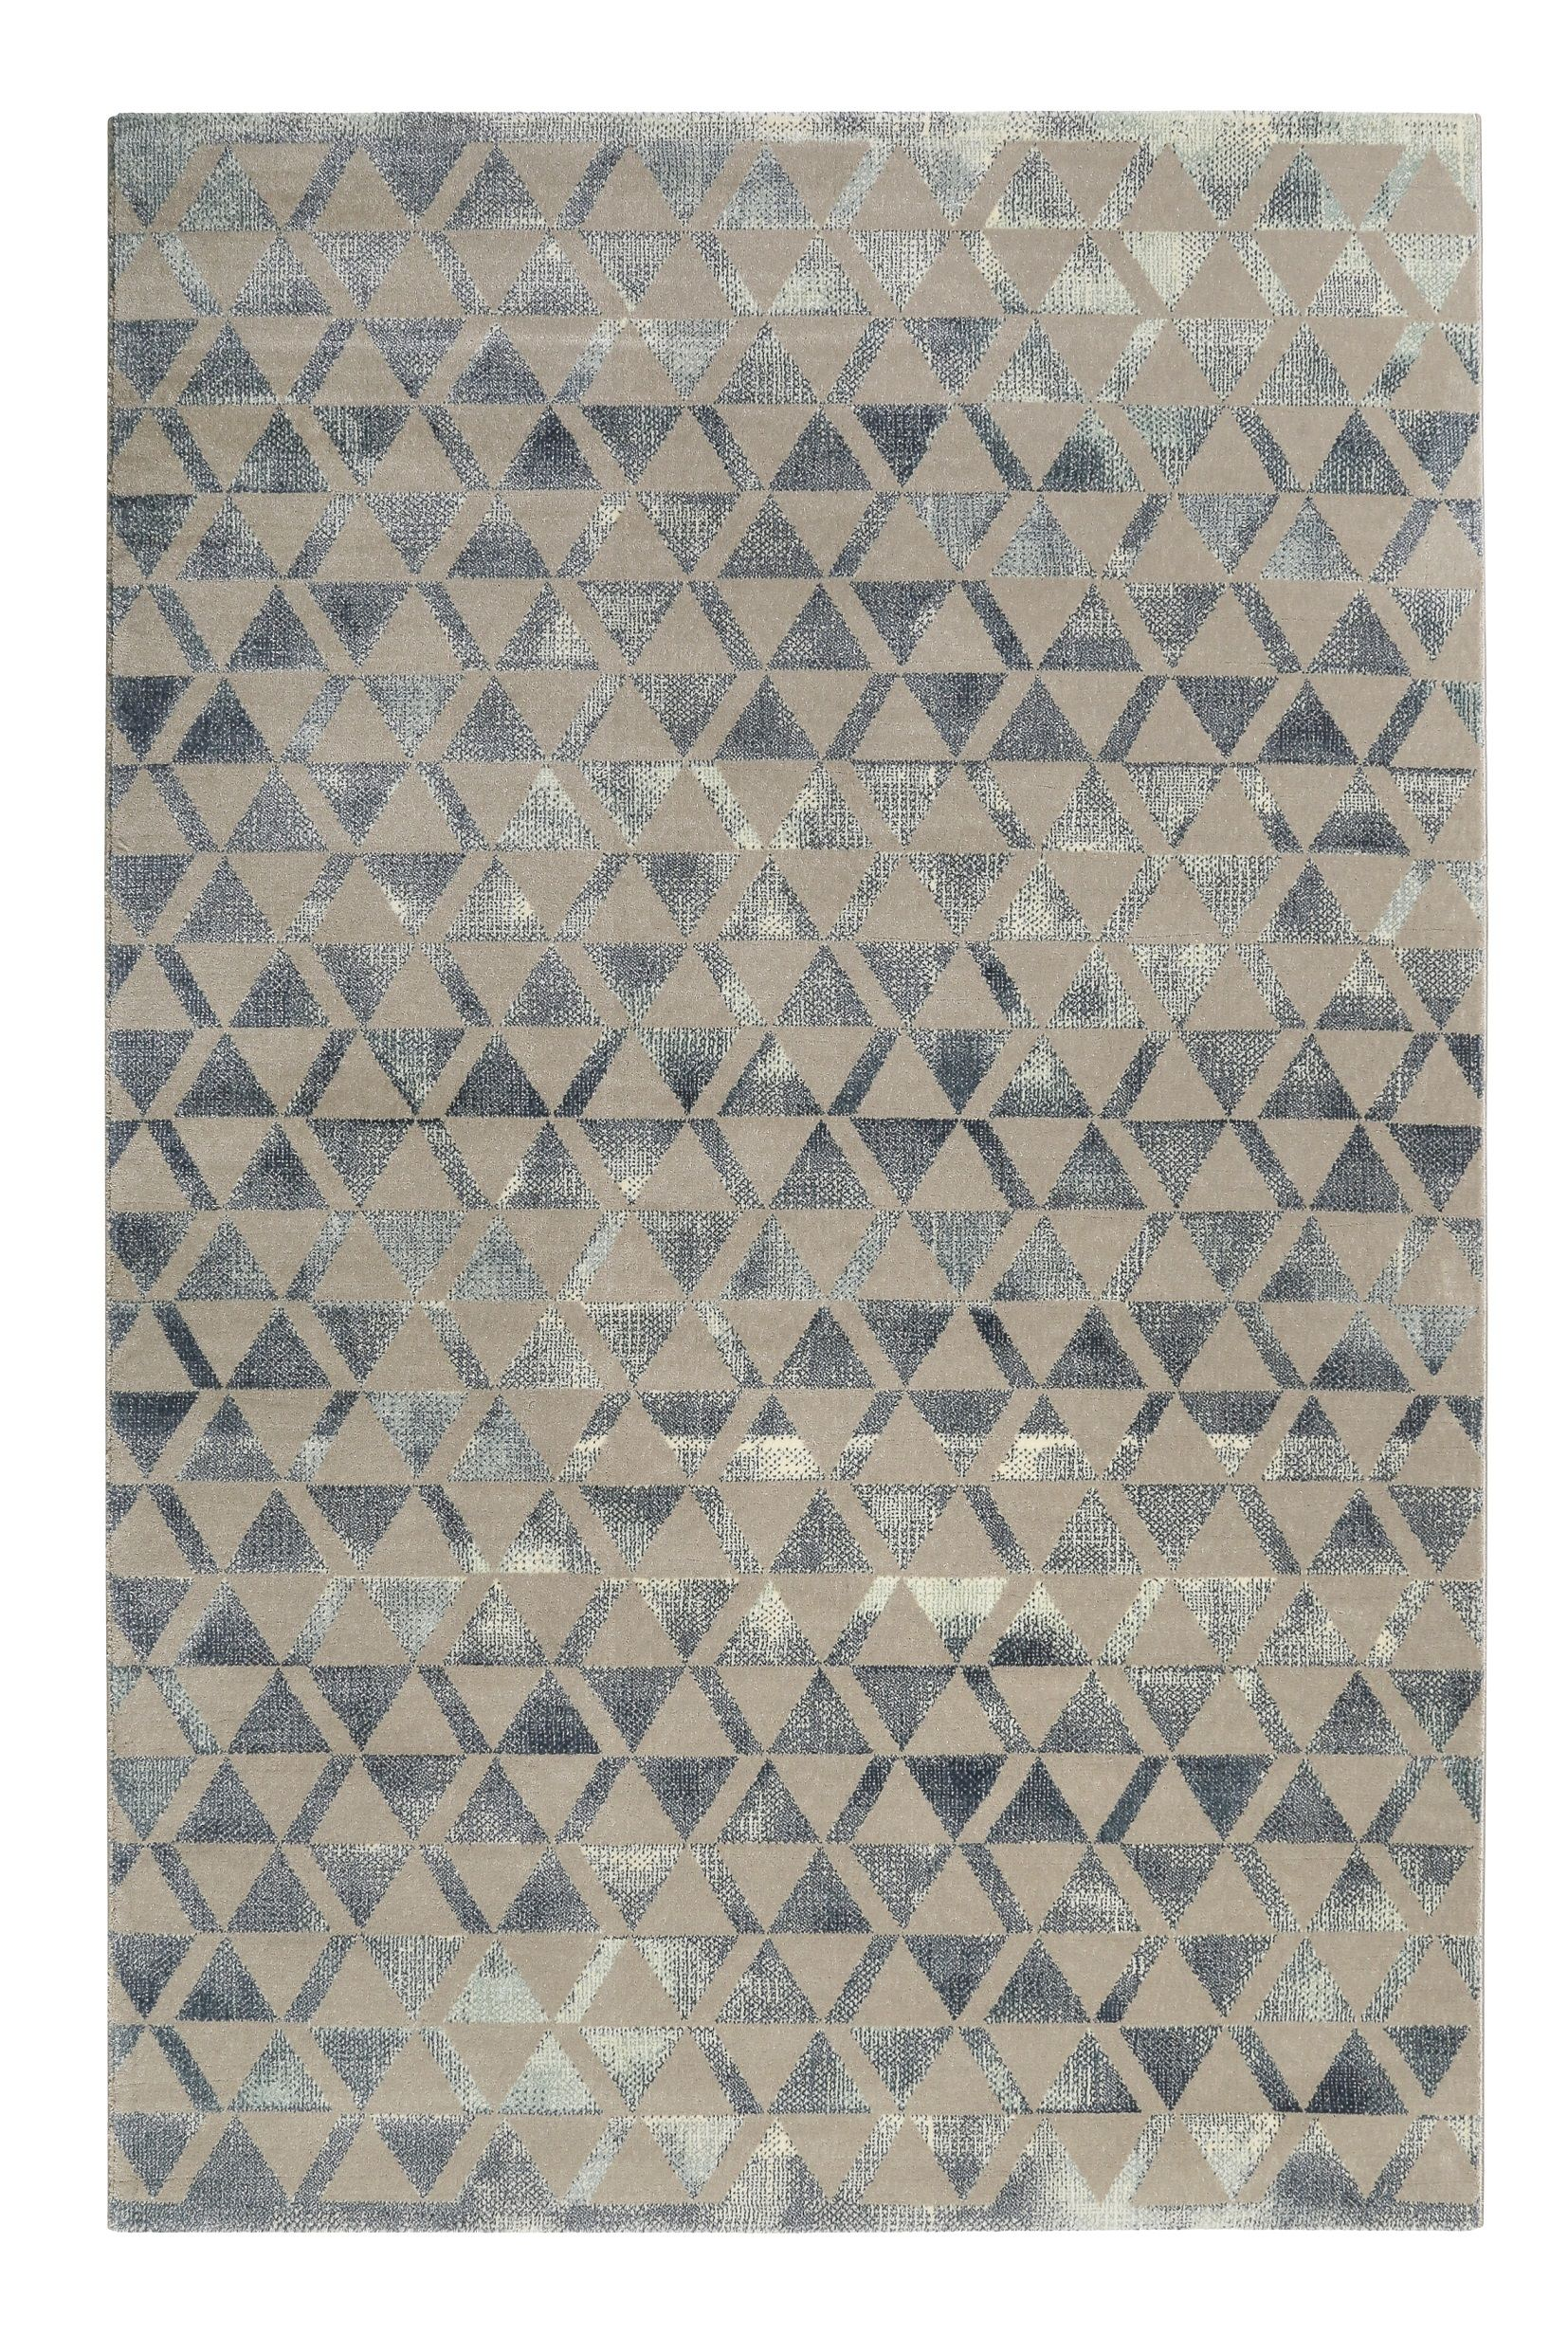 Teppich Grau Blau Silber Kurzflor Pearl 2 Wecon Home Kurzflor Teppiche Teppich Grau Teppich